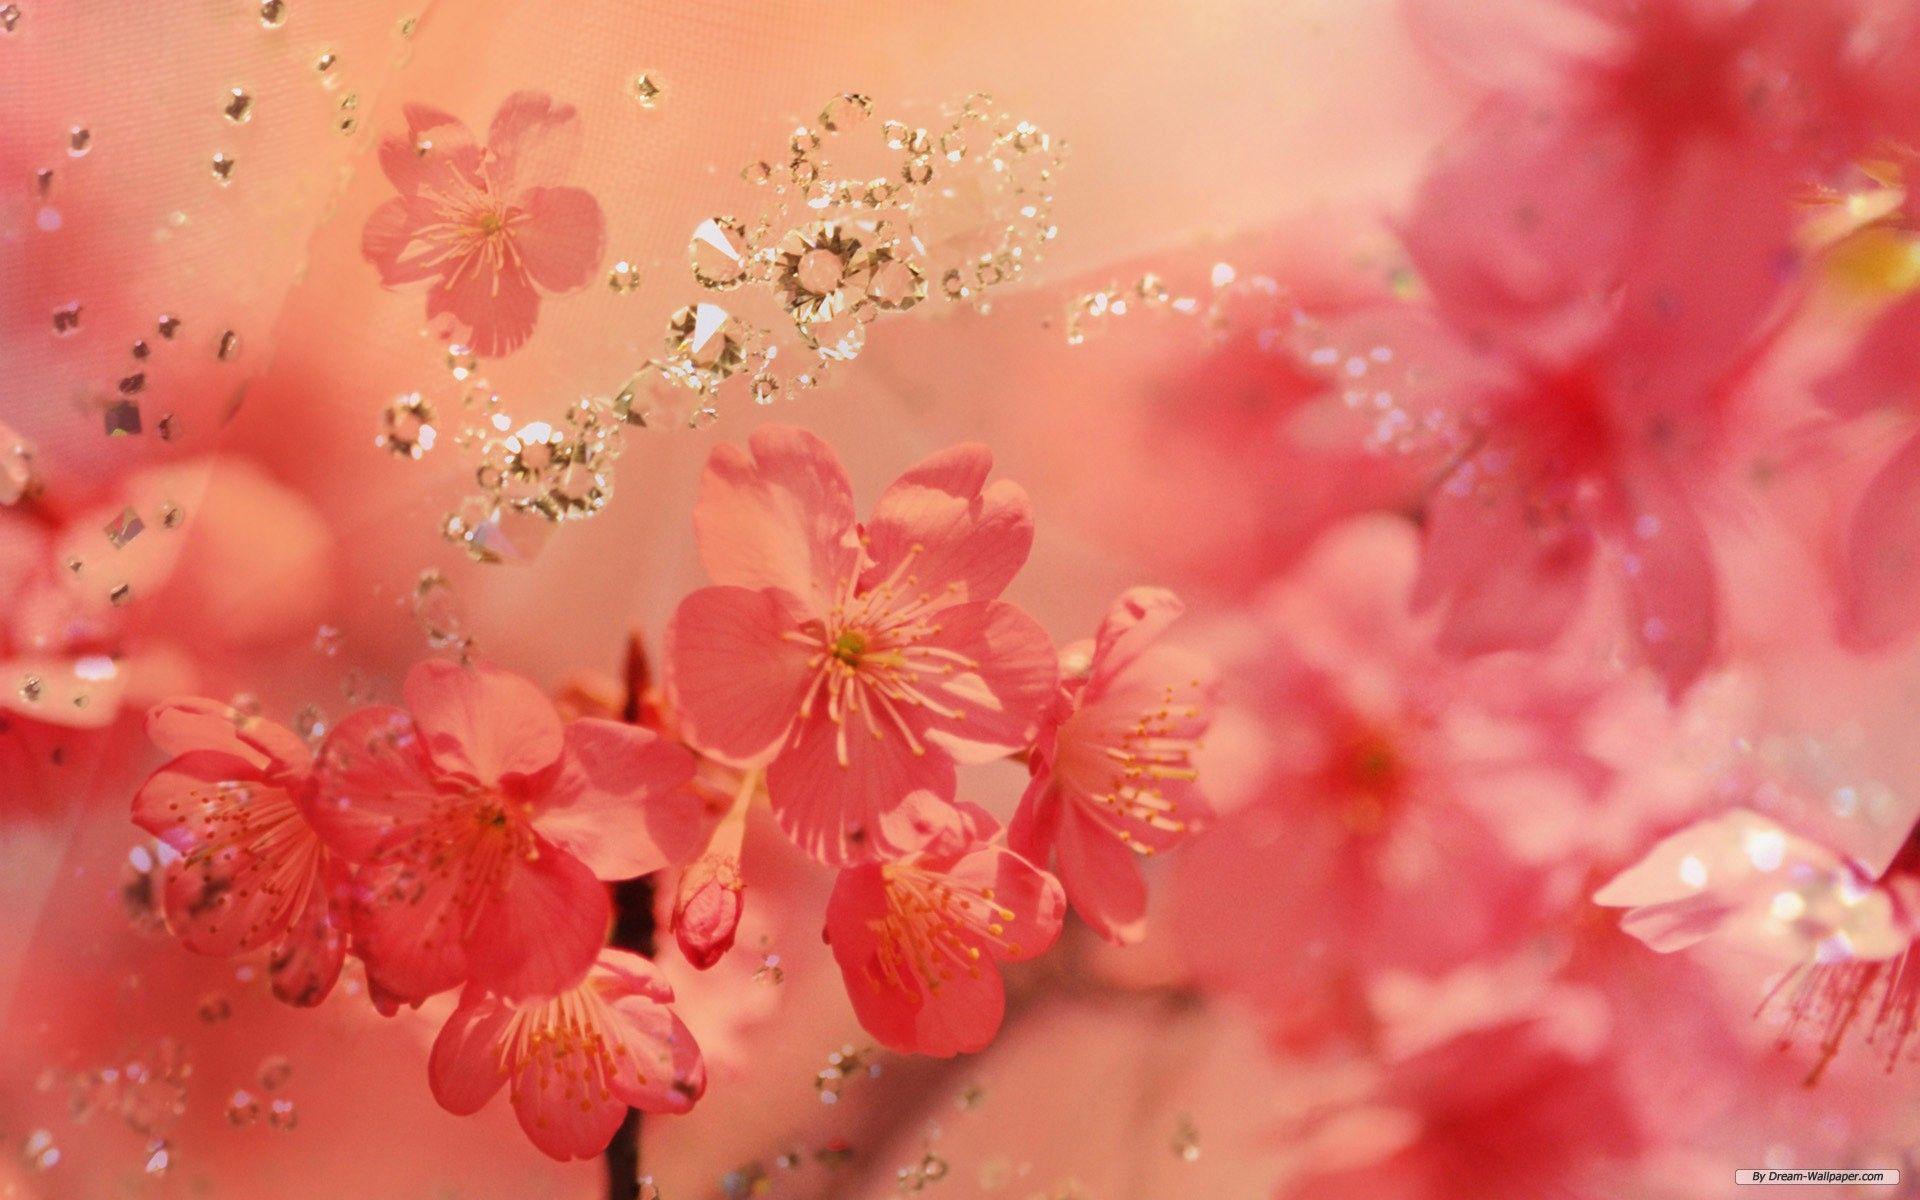 best ideas about Rose flower wallpaper on Pinterest Flower HD